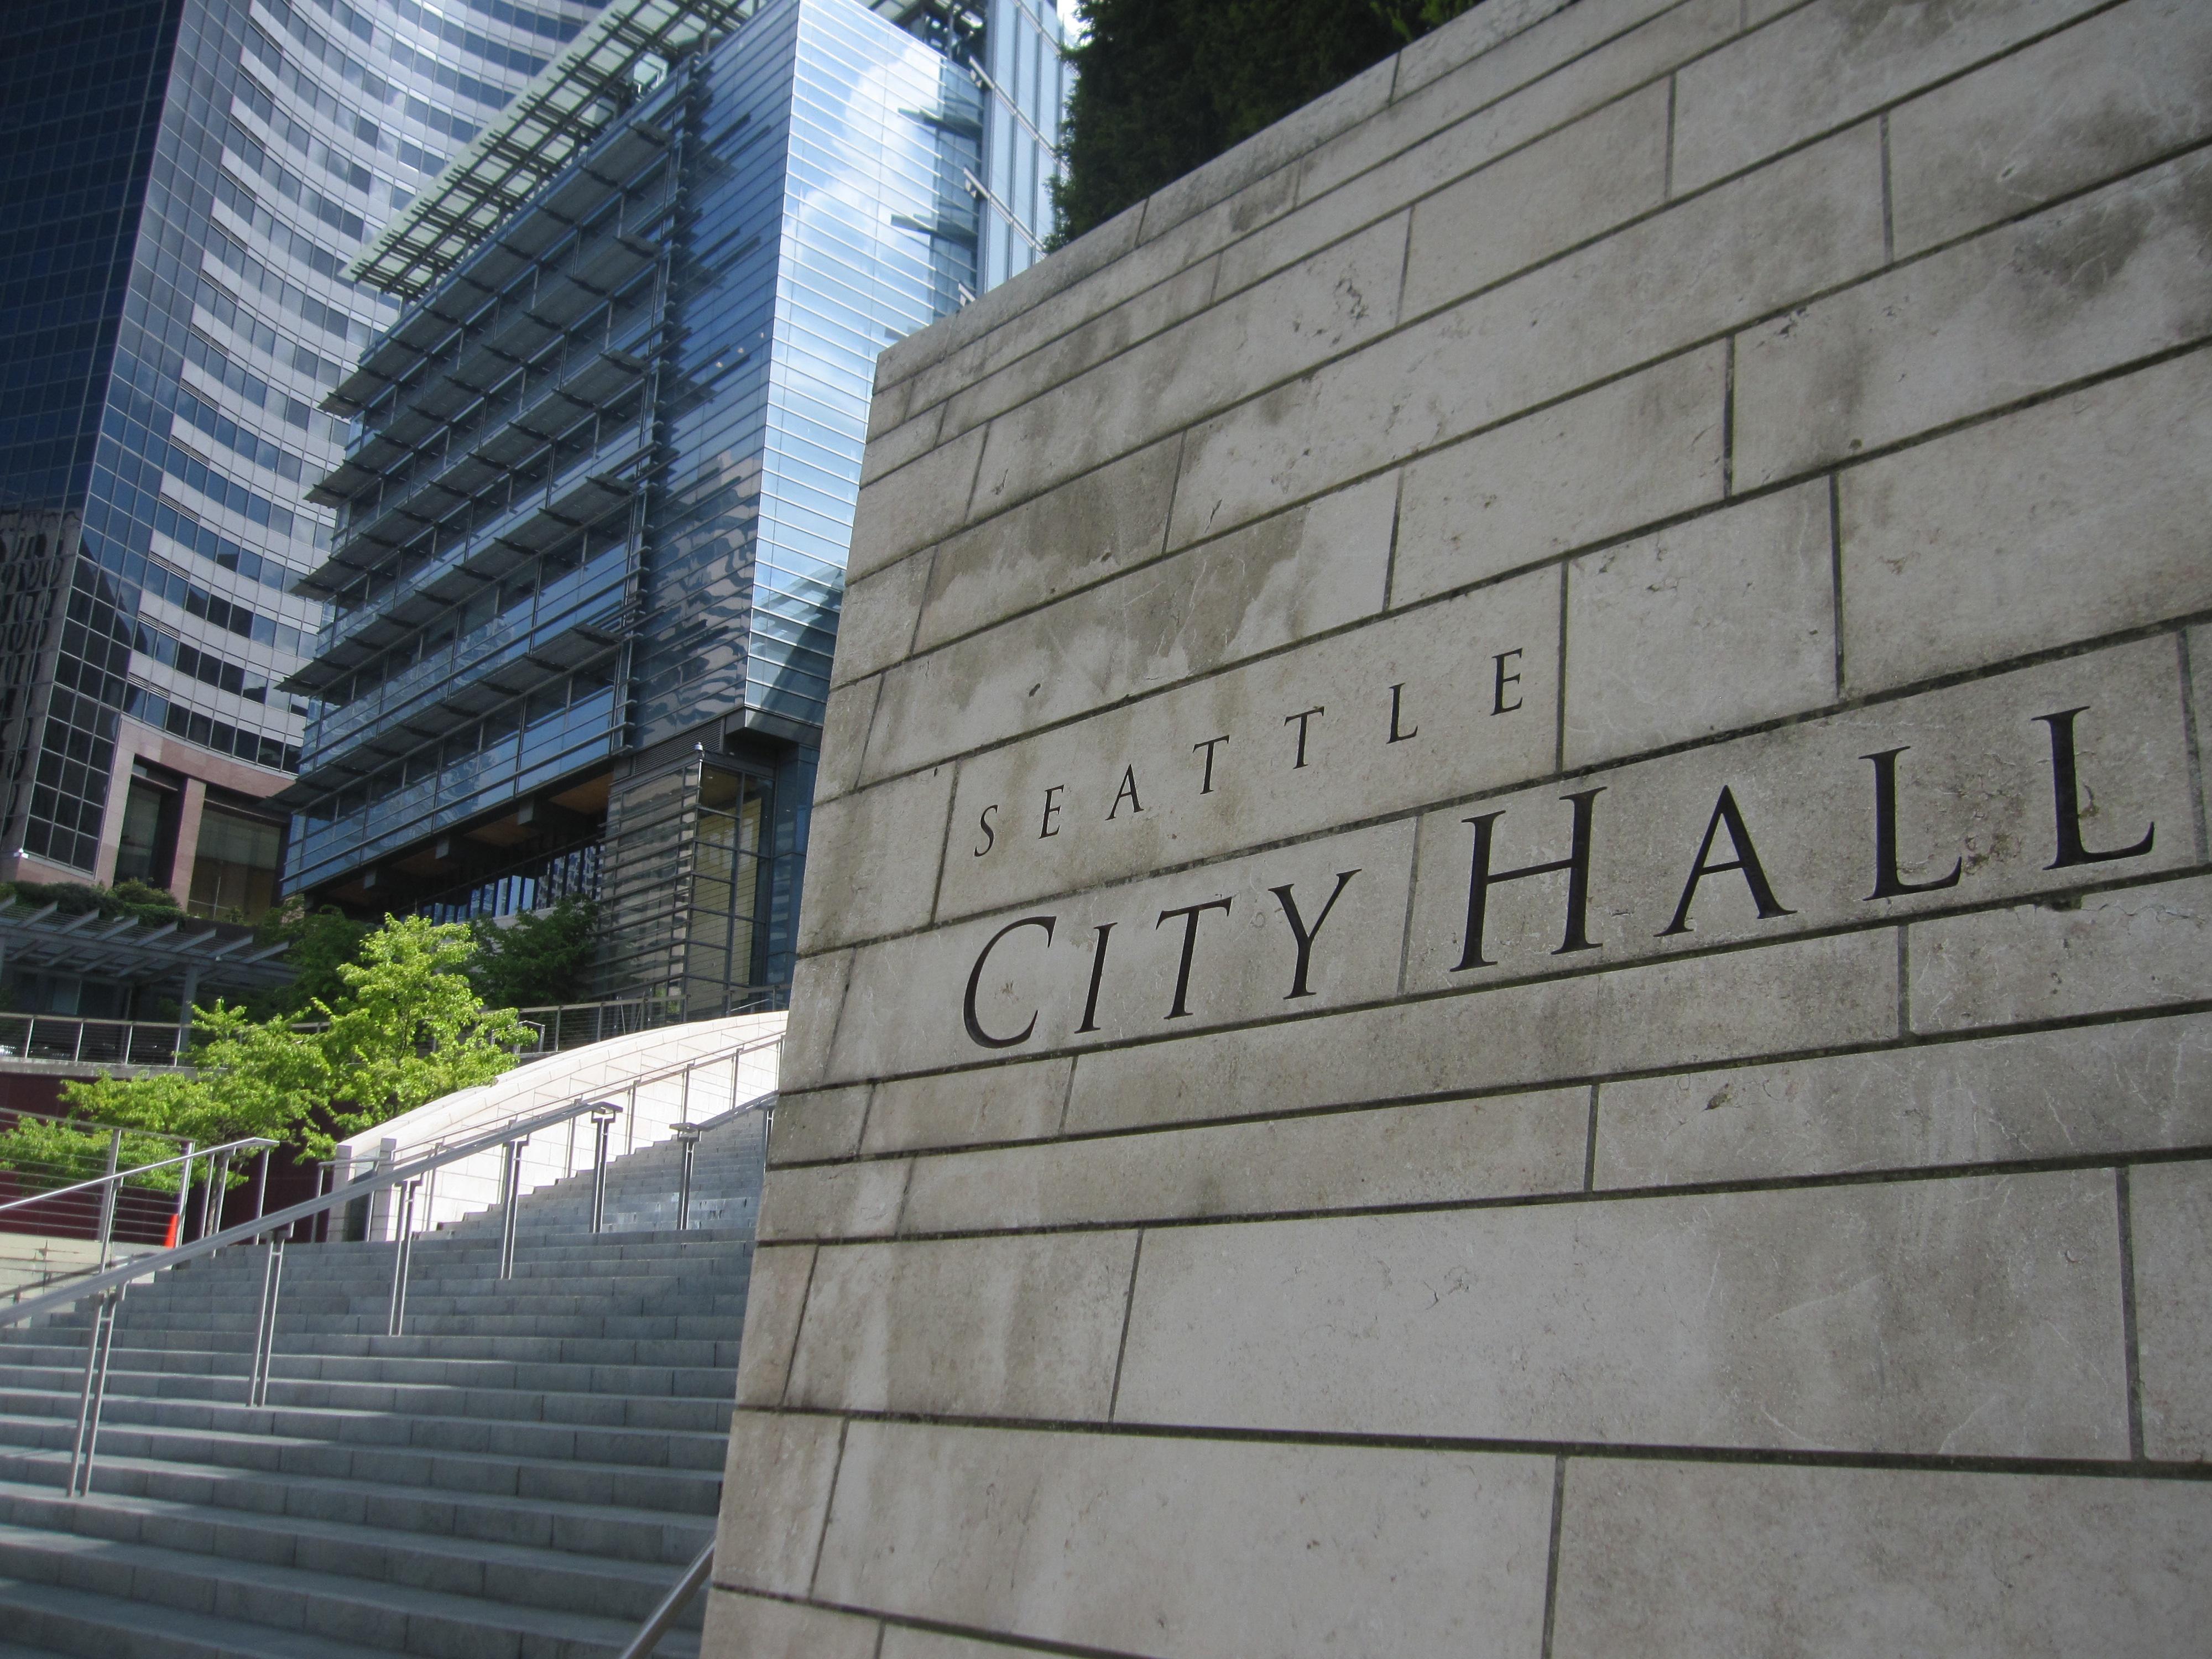 Seattle City Hall